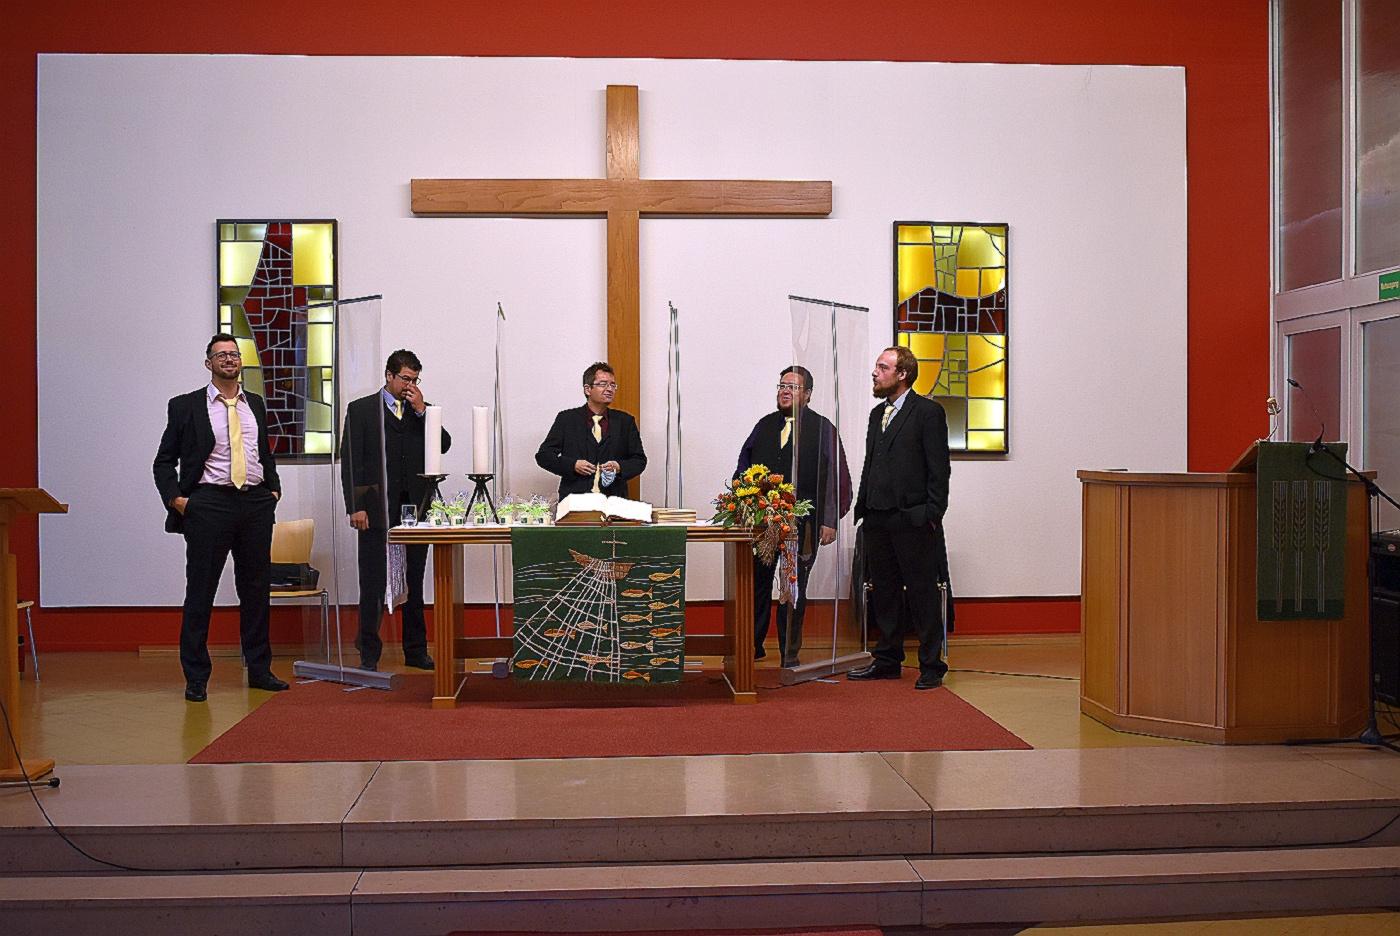 LaMannschar bei Konfirmation im Martin-Luther-Haus (Foto: U. Schmidt)